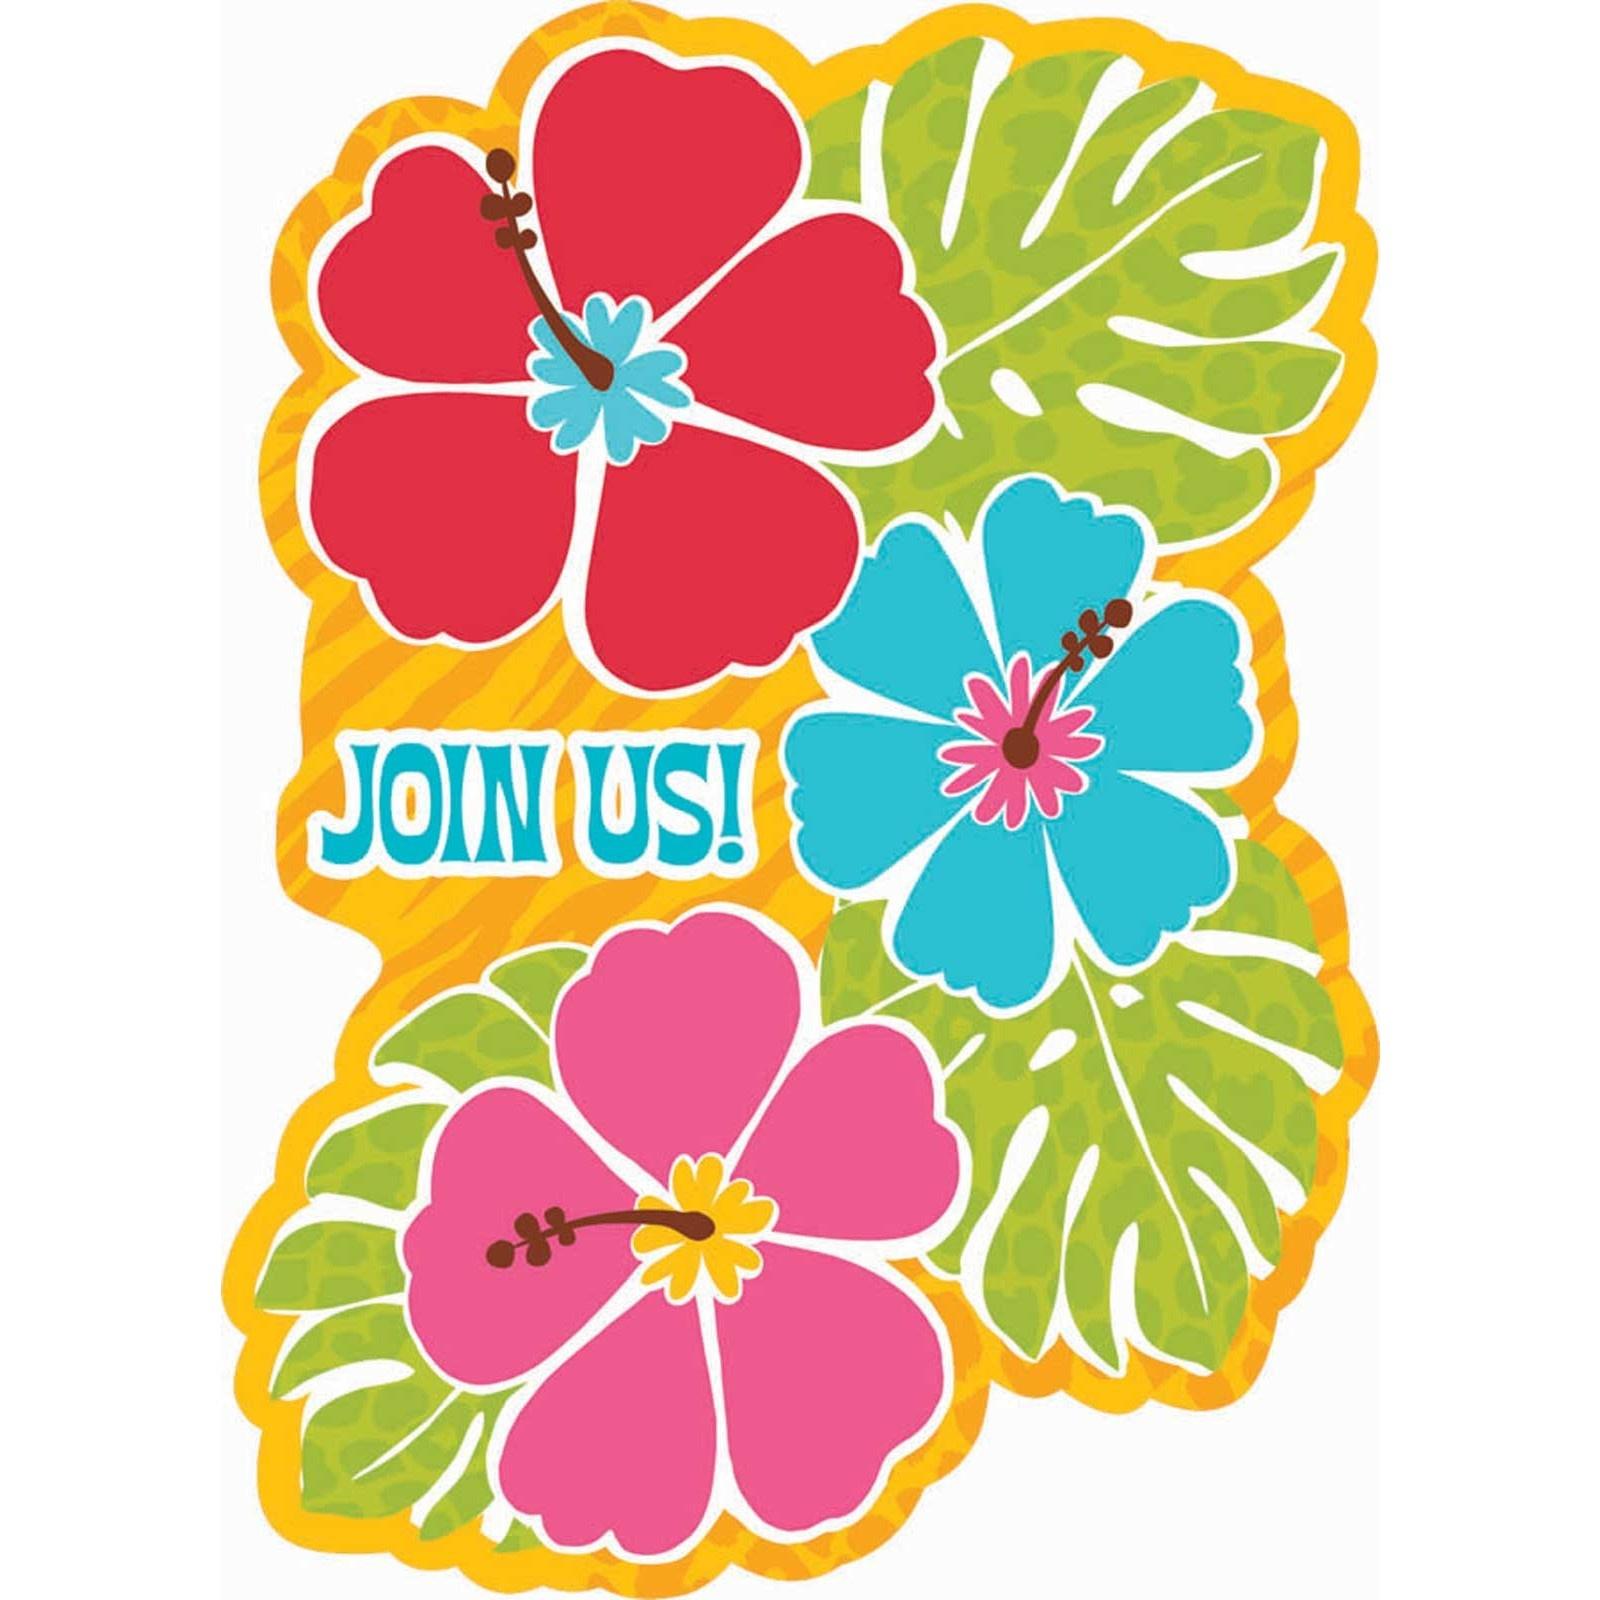 Free Hawaiian Invitations Cliparts, Download Free Clip Art, Free - Free Printable Luau Clipart